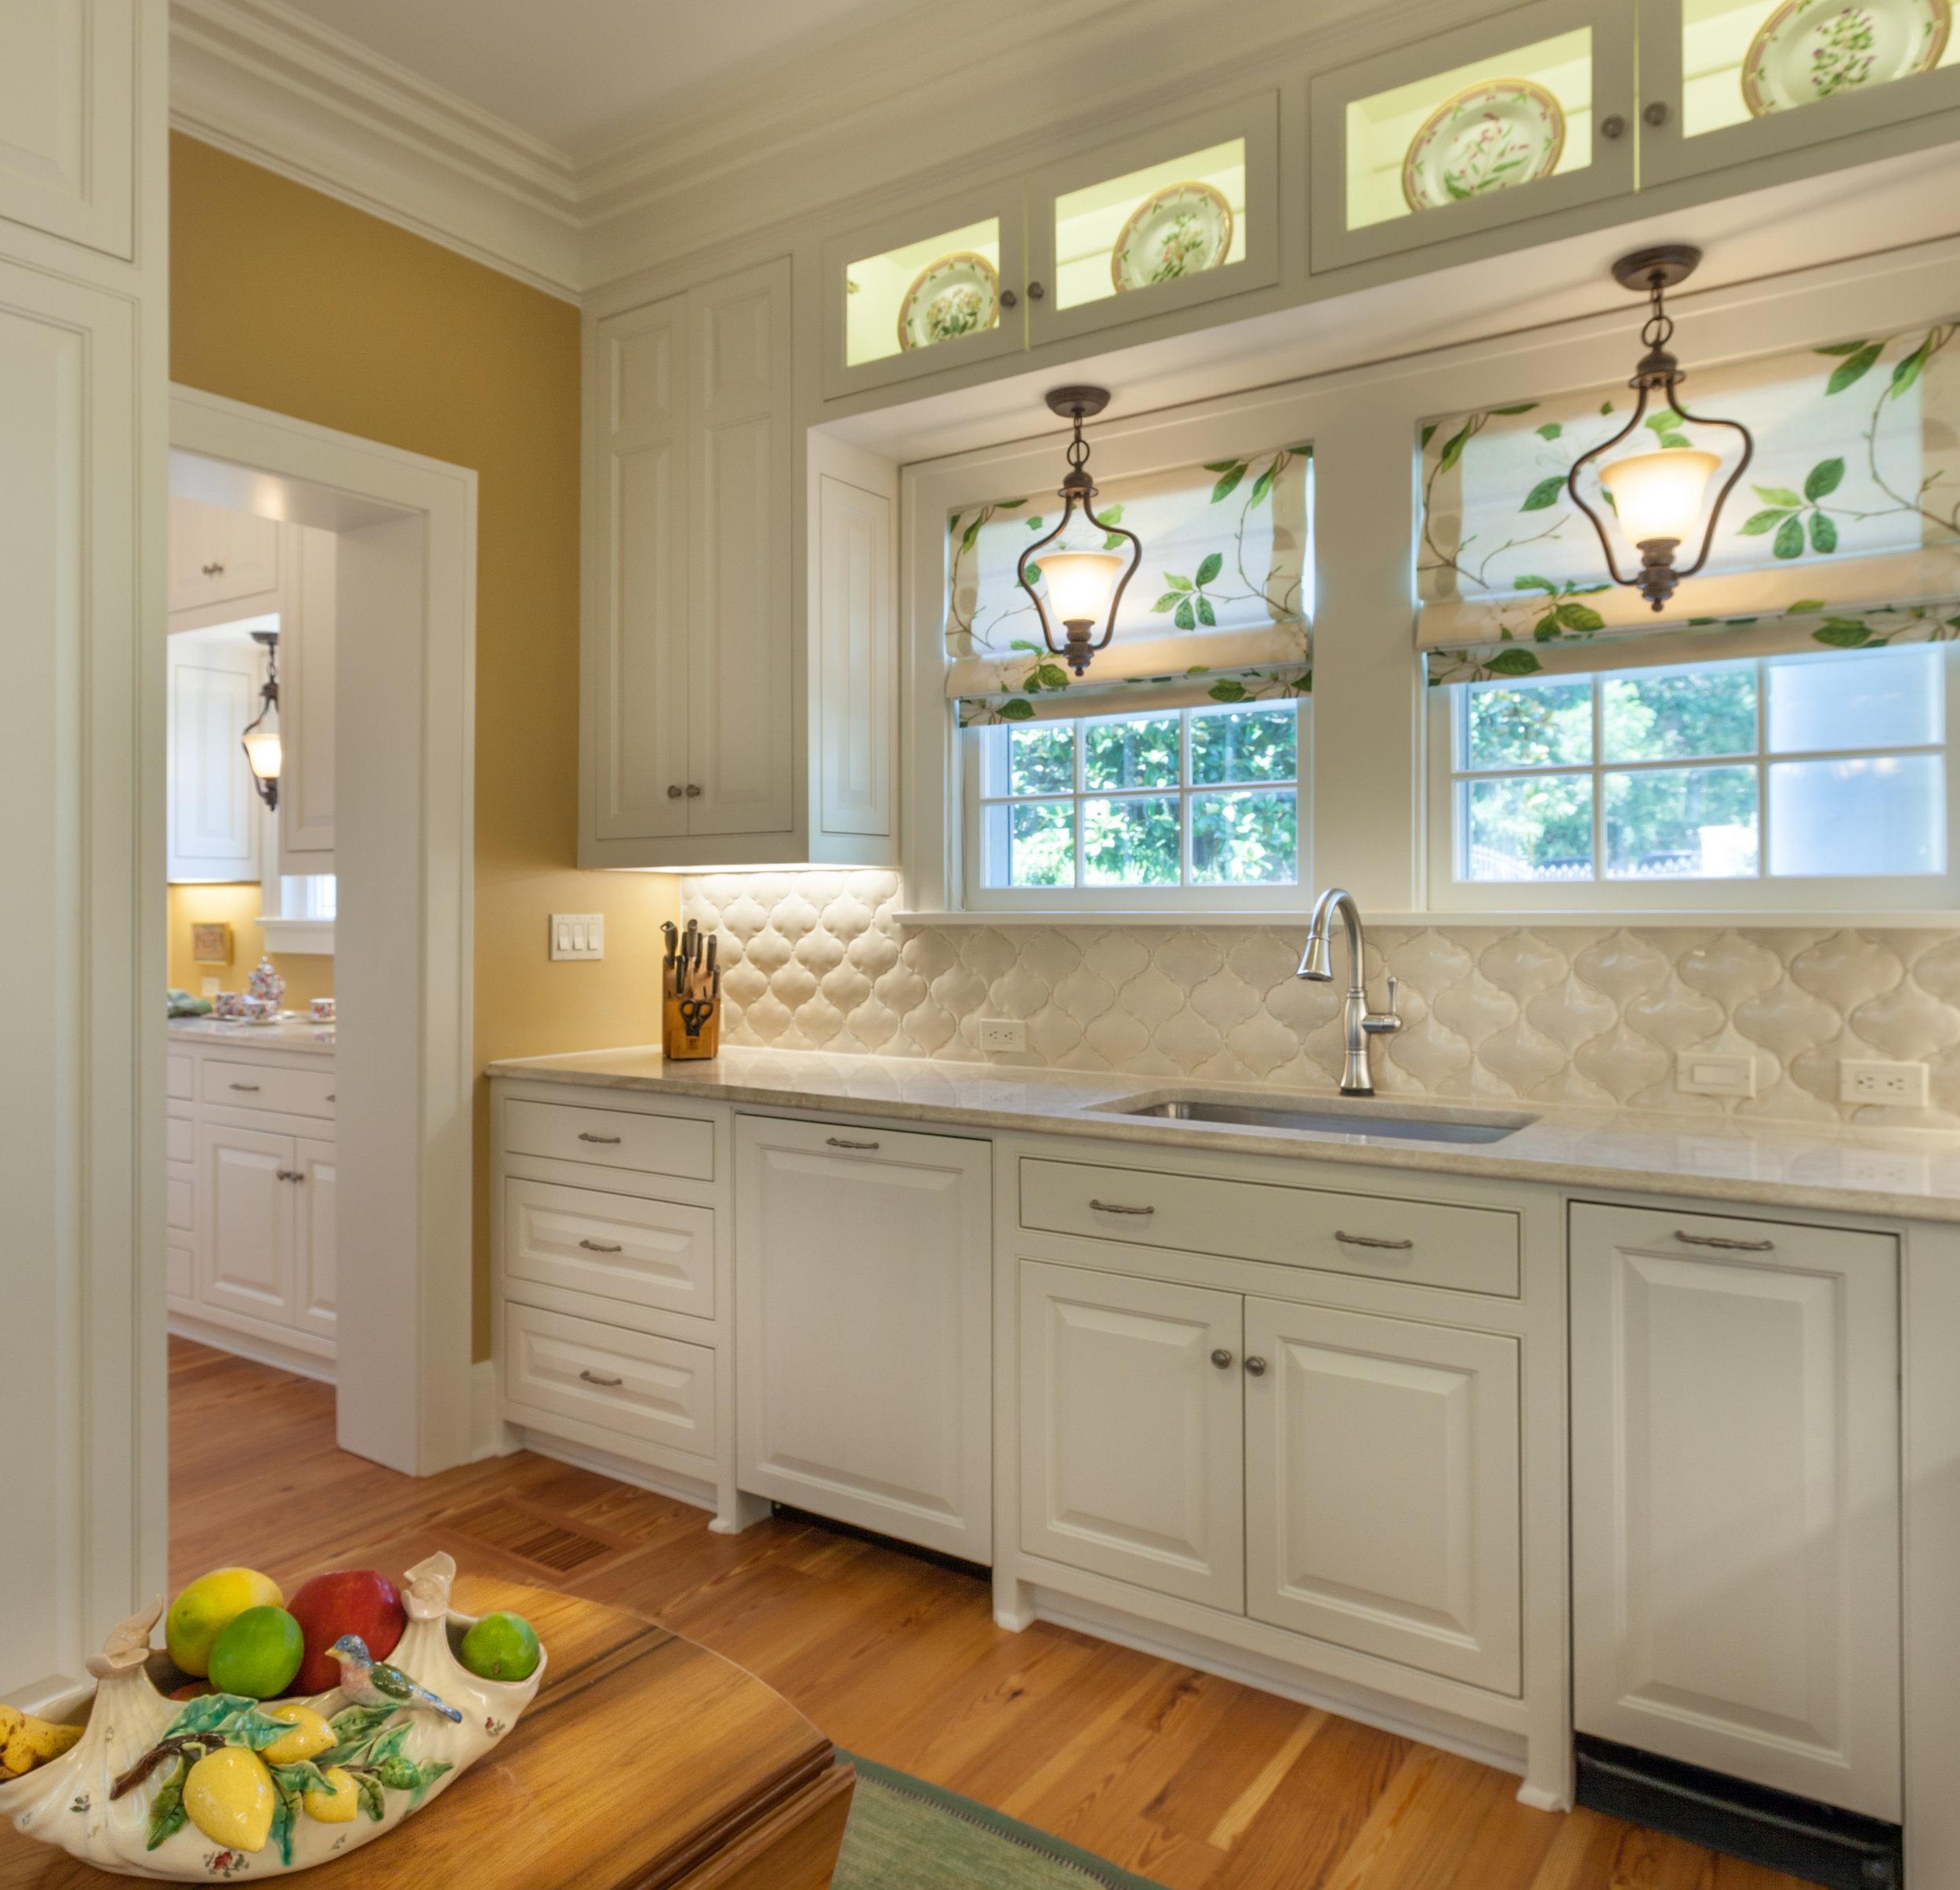 LOUISIANA - Sink Cabinets 2.jpg